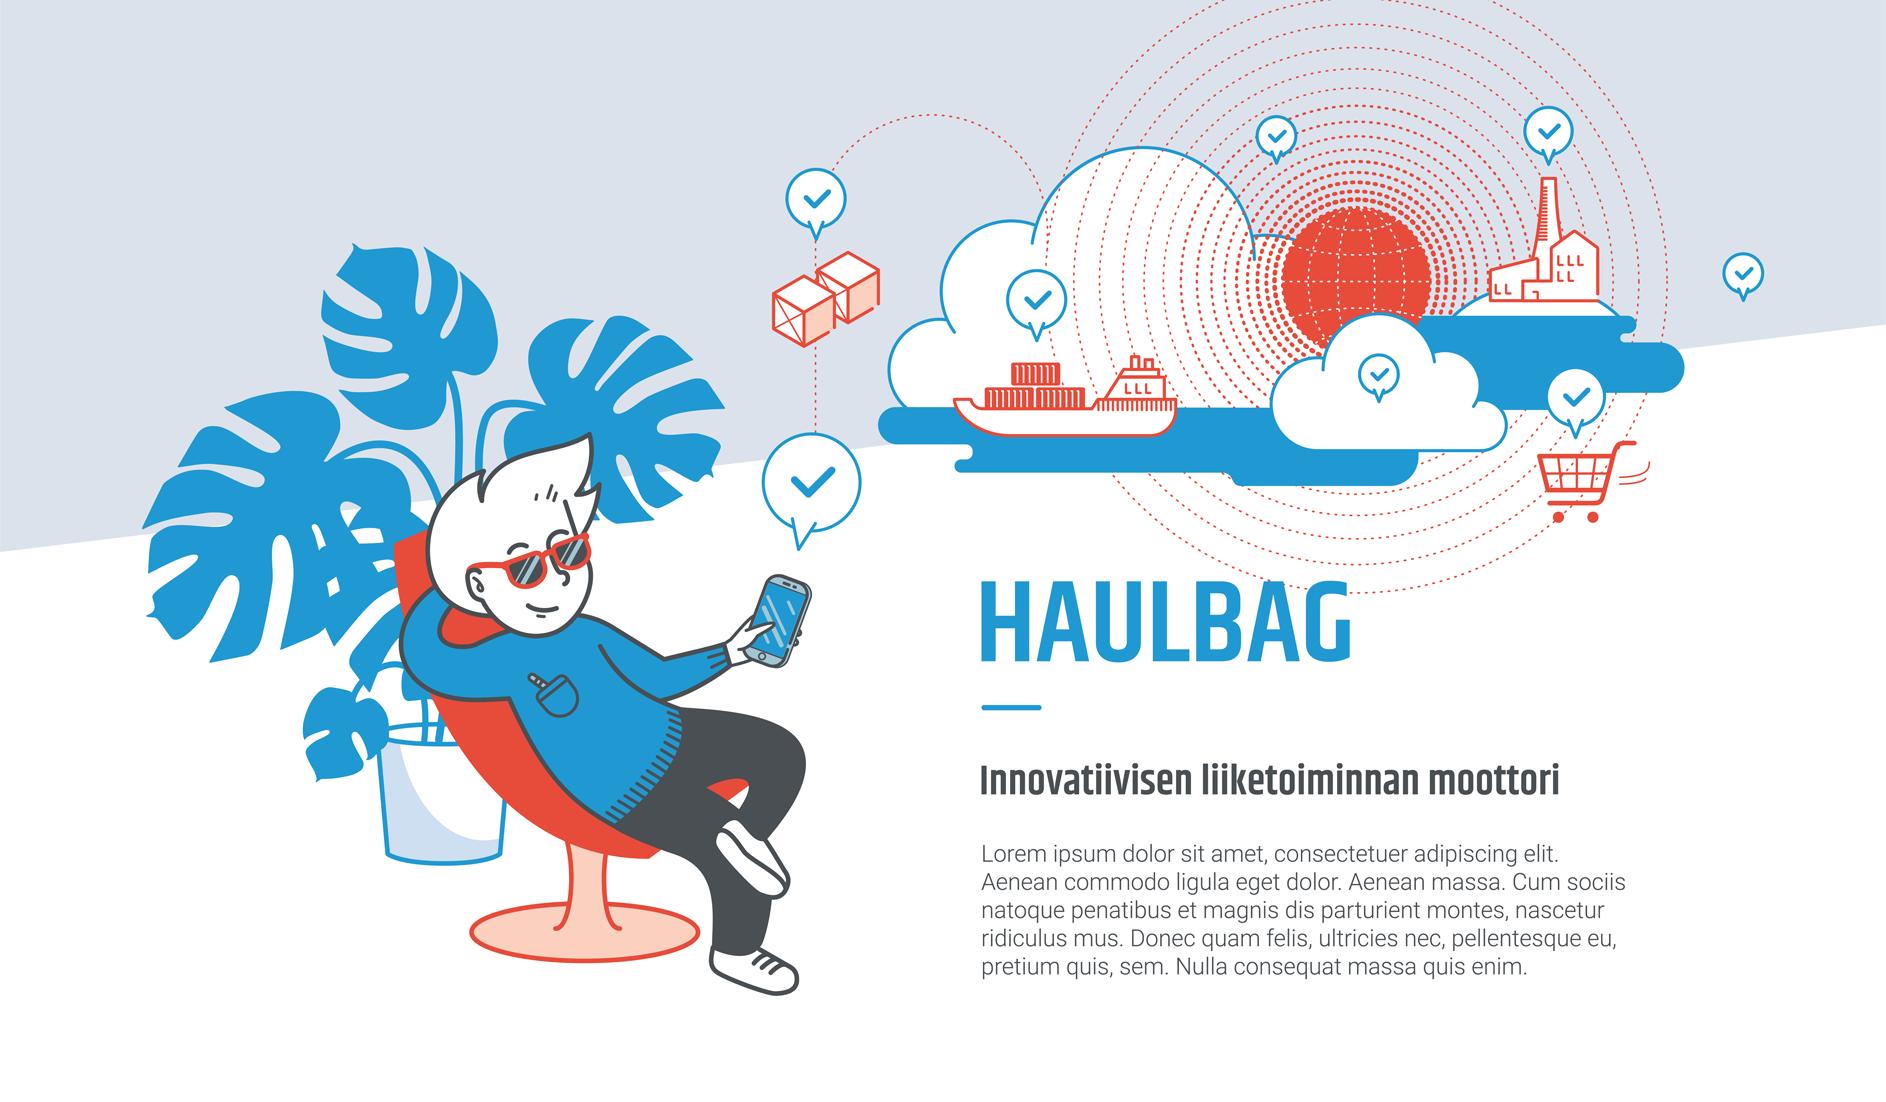 Haulbag service illustration